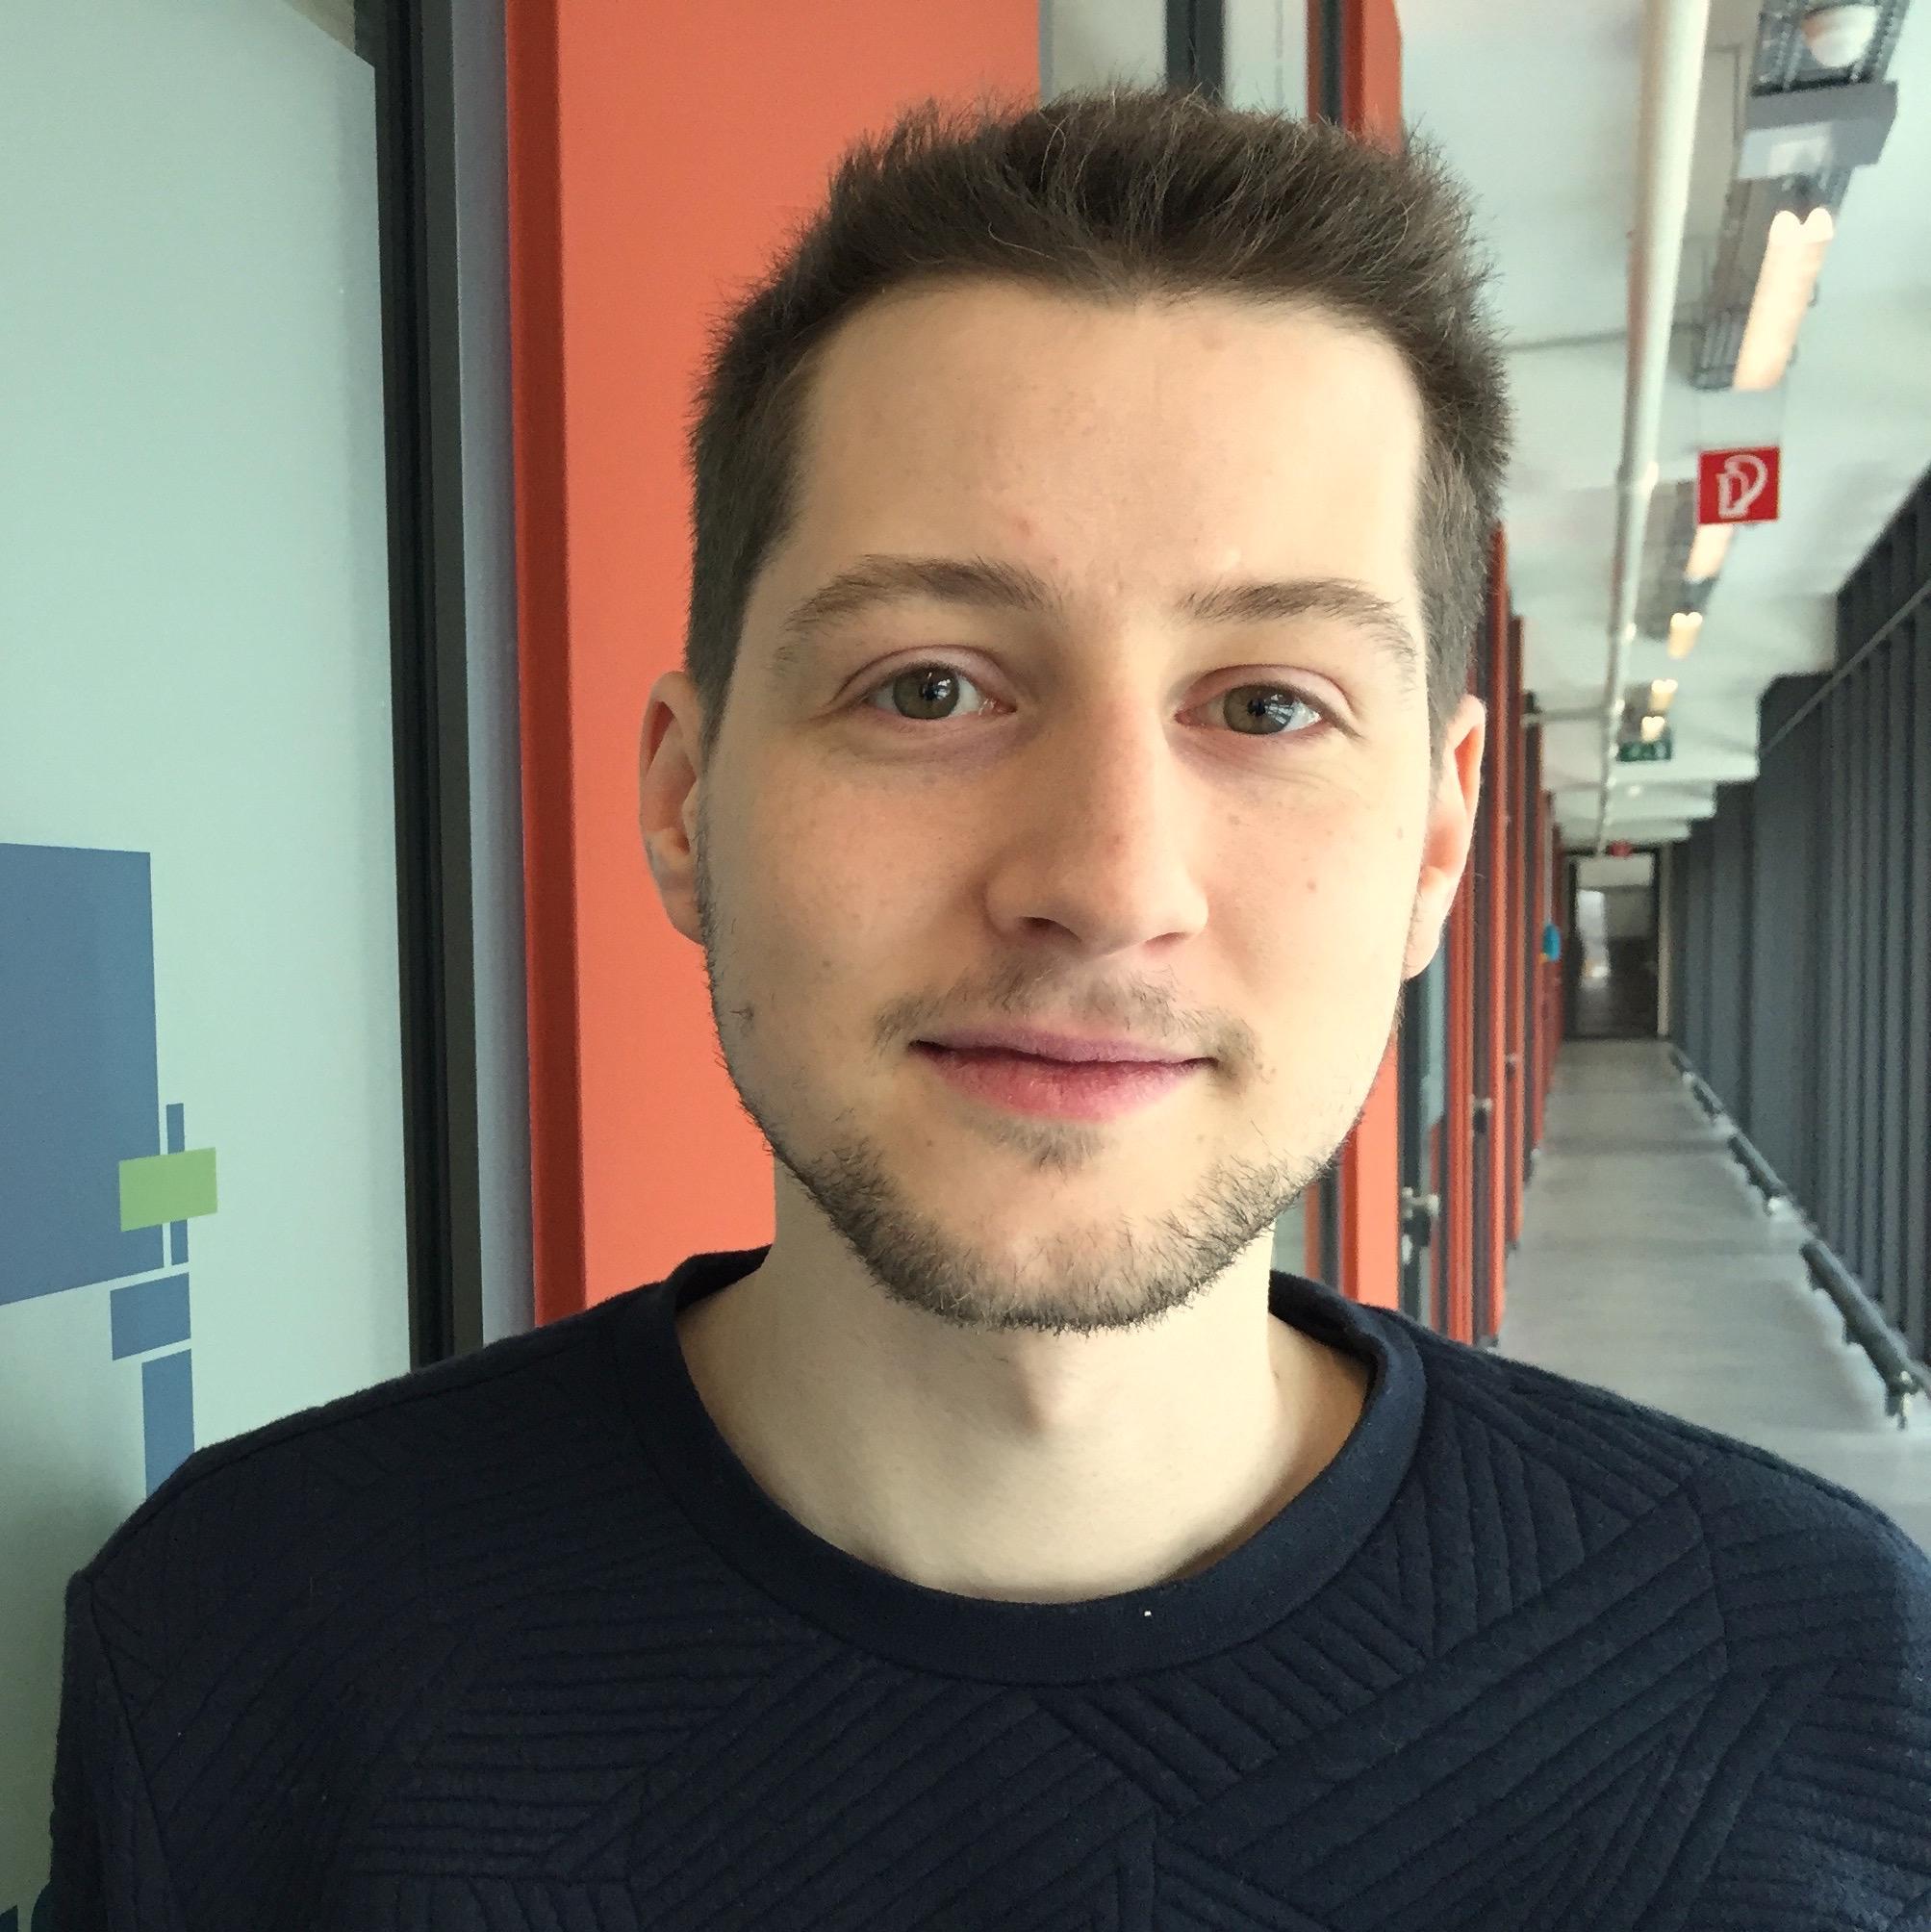 Pierre Tomasina